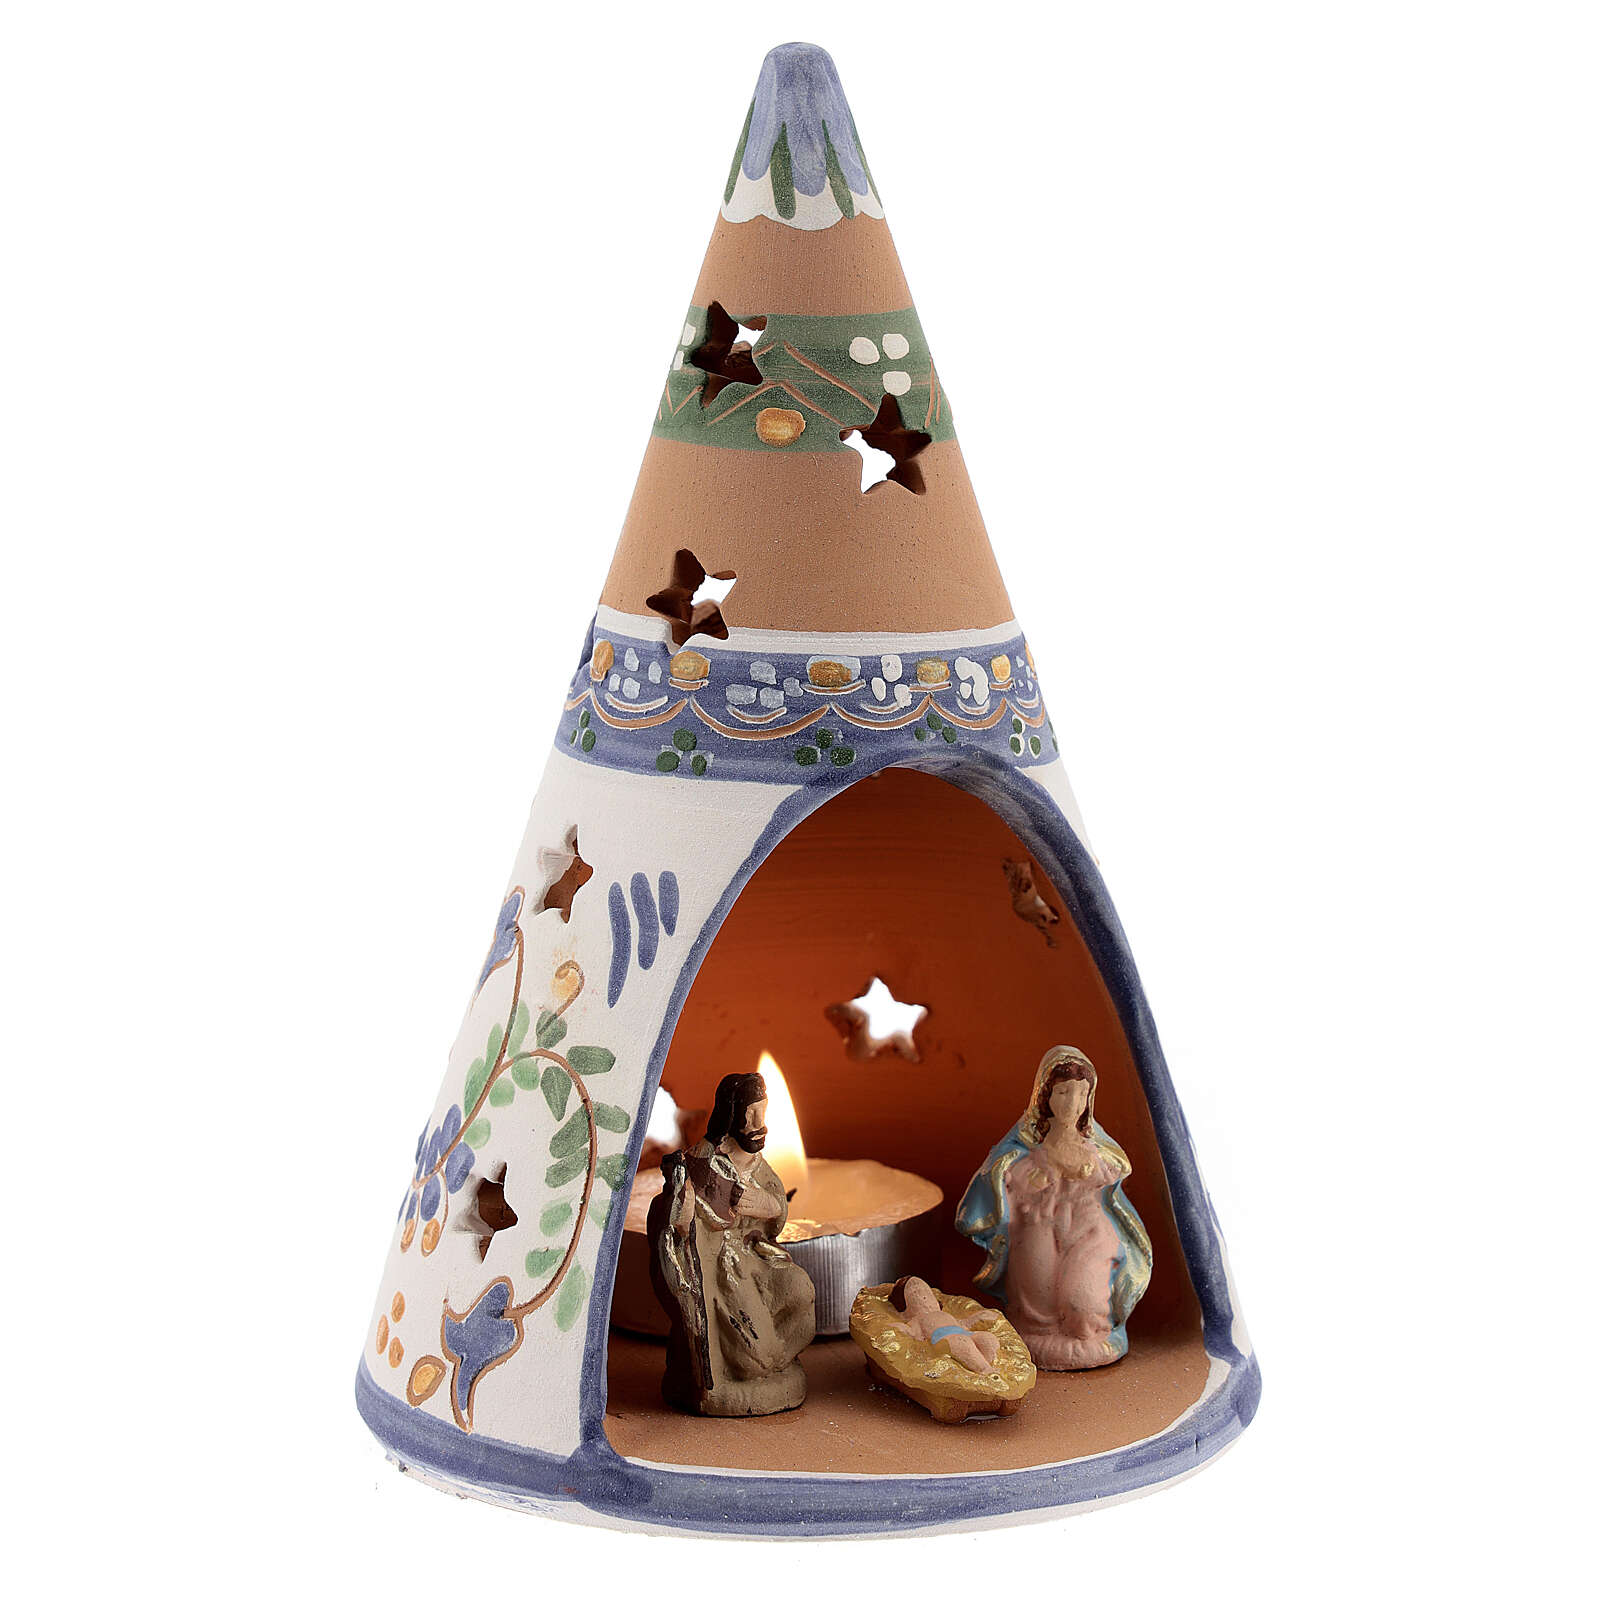 Cone tree Holy Family set Deruta terracotta blue 15 cm 4